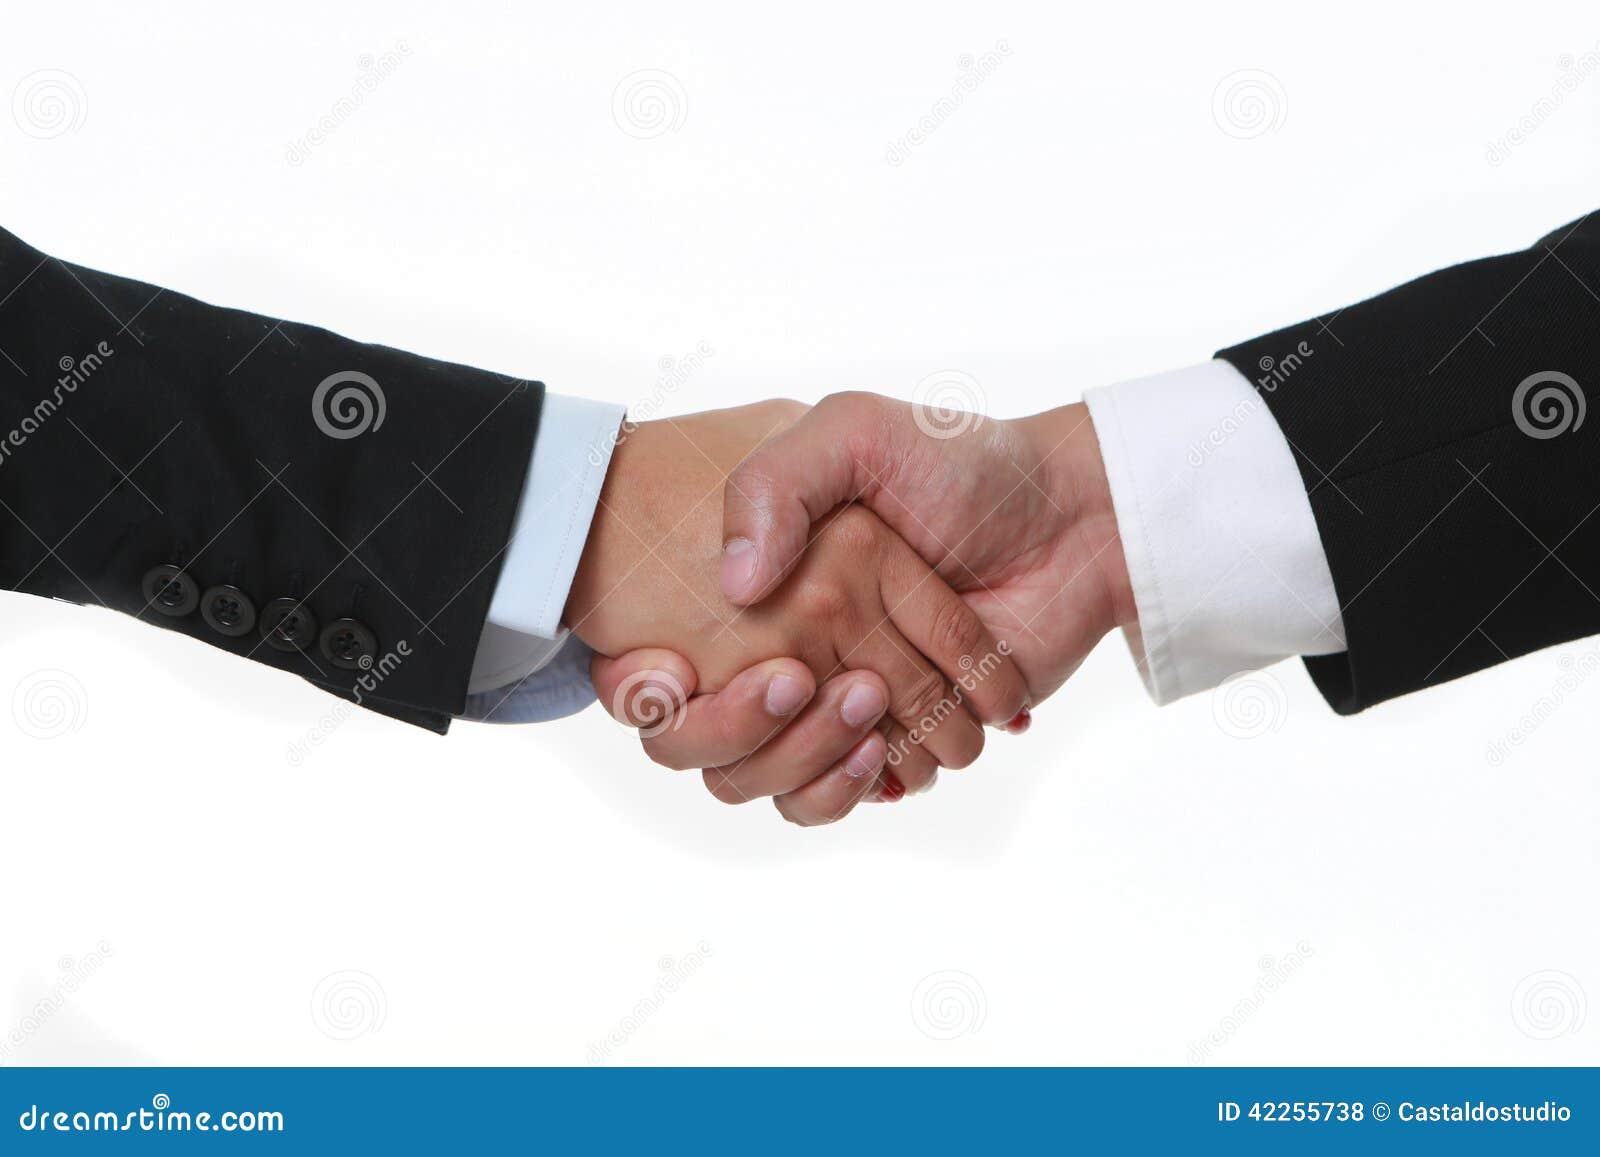 Hand shake stock photo image 42255738 for Ohrensessel 2 hand